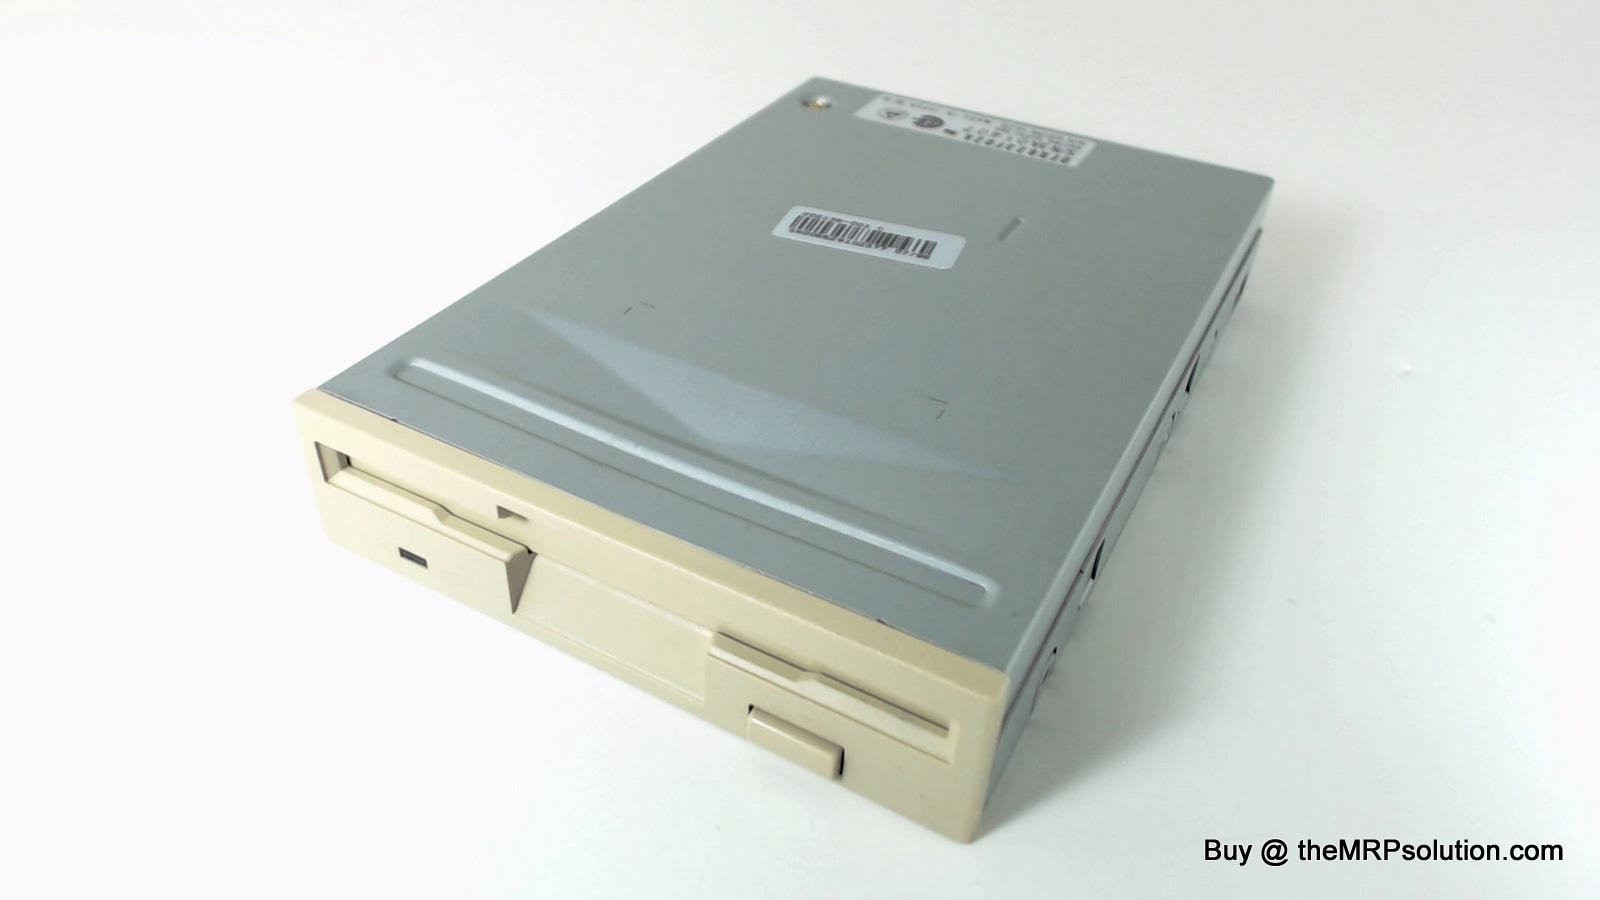 PRINTRONIX 172637-001 DISK DRIVE, 6408-CTA New